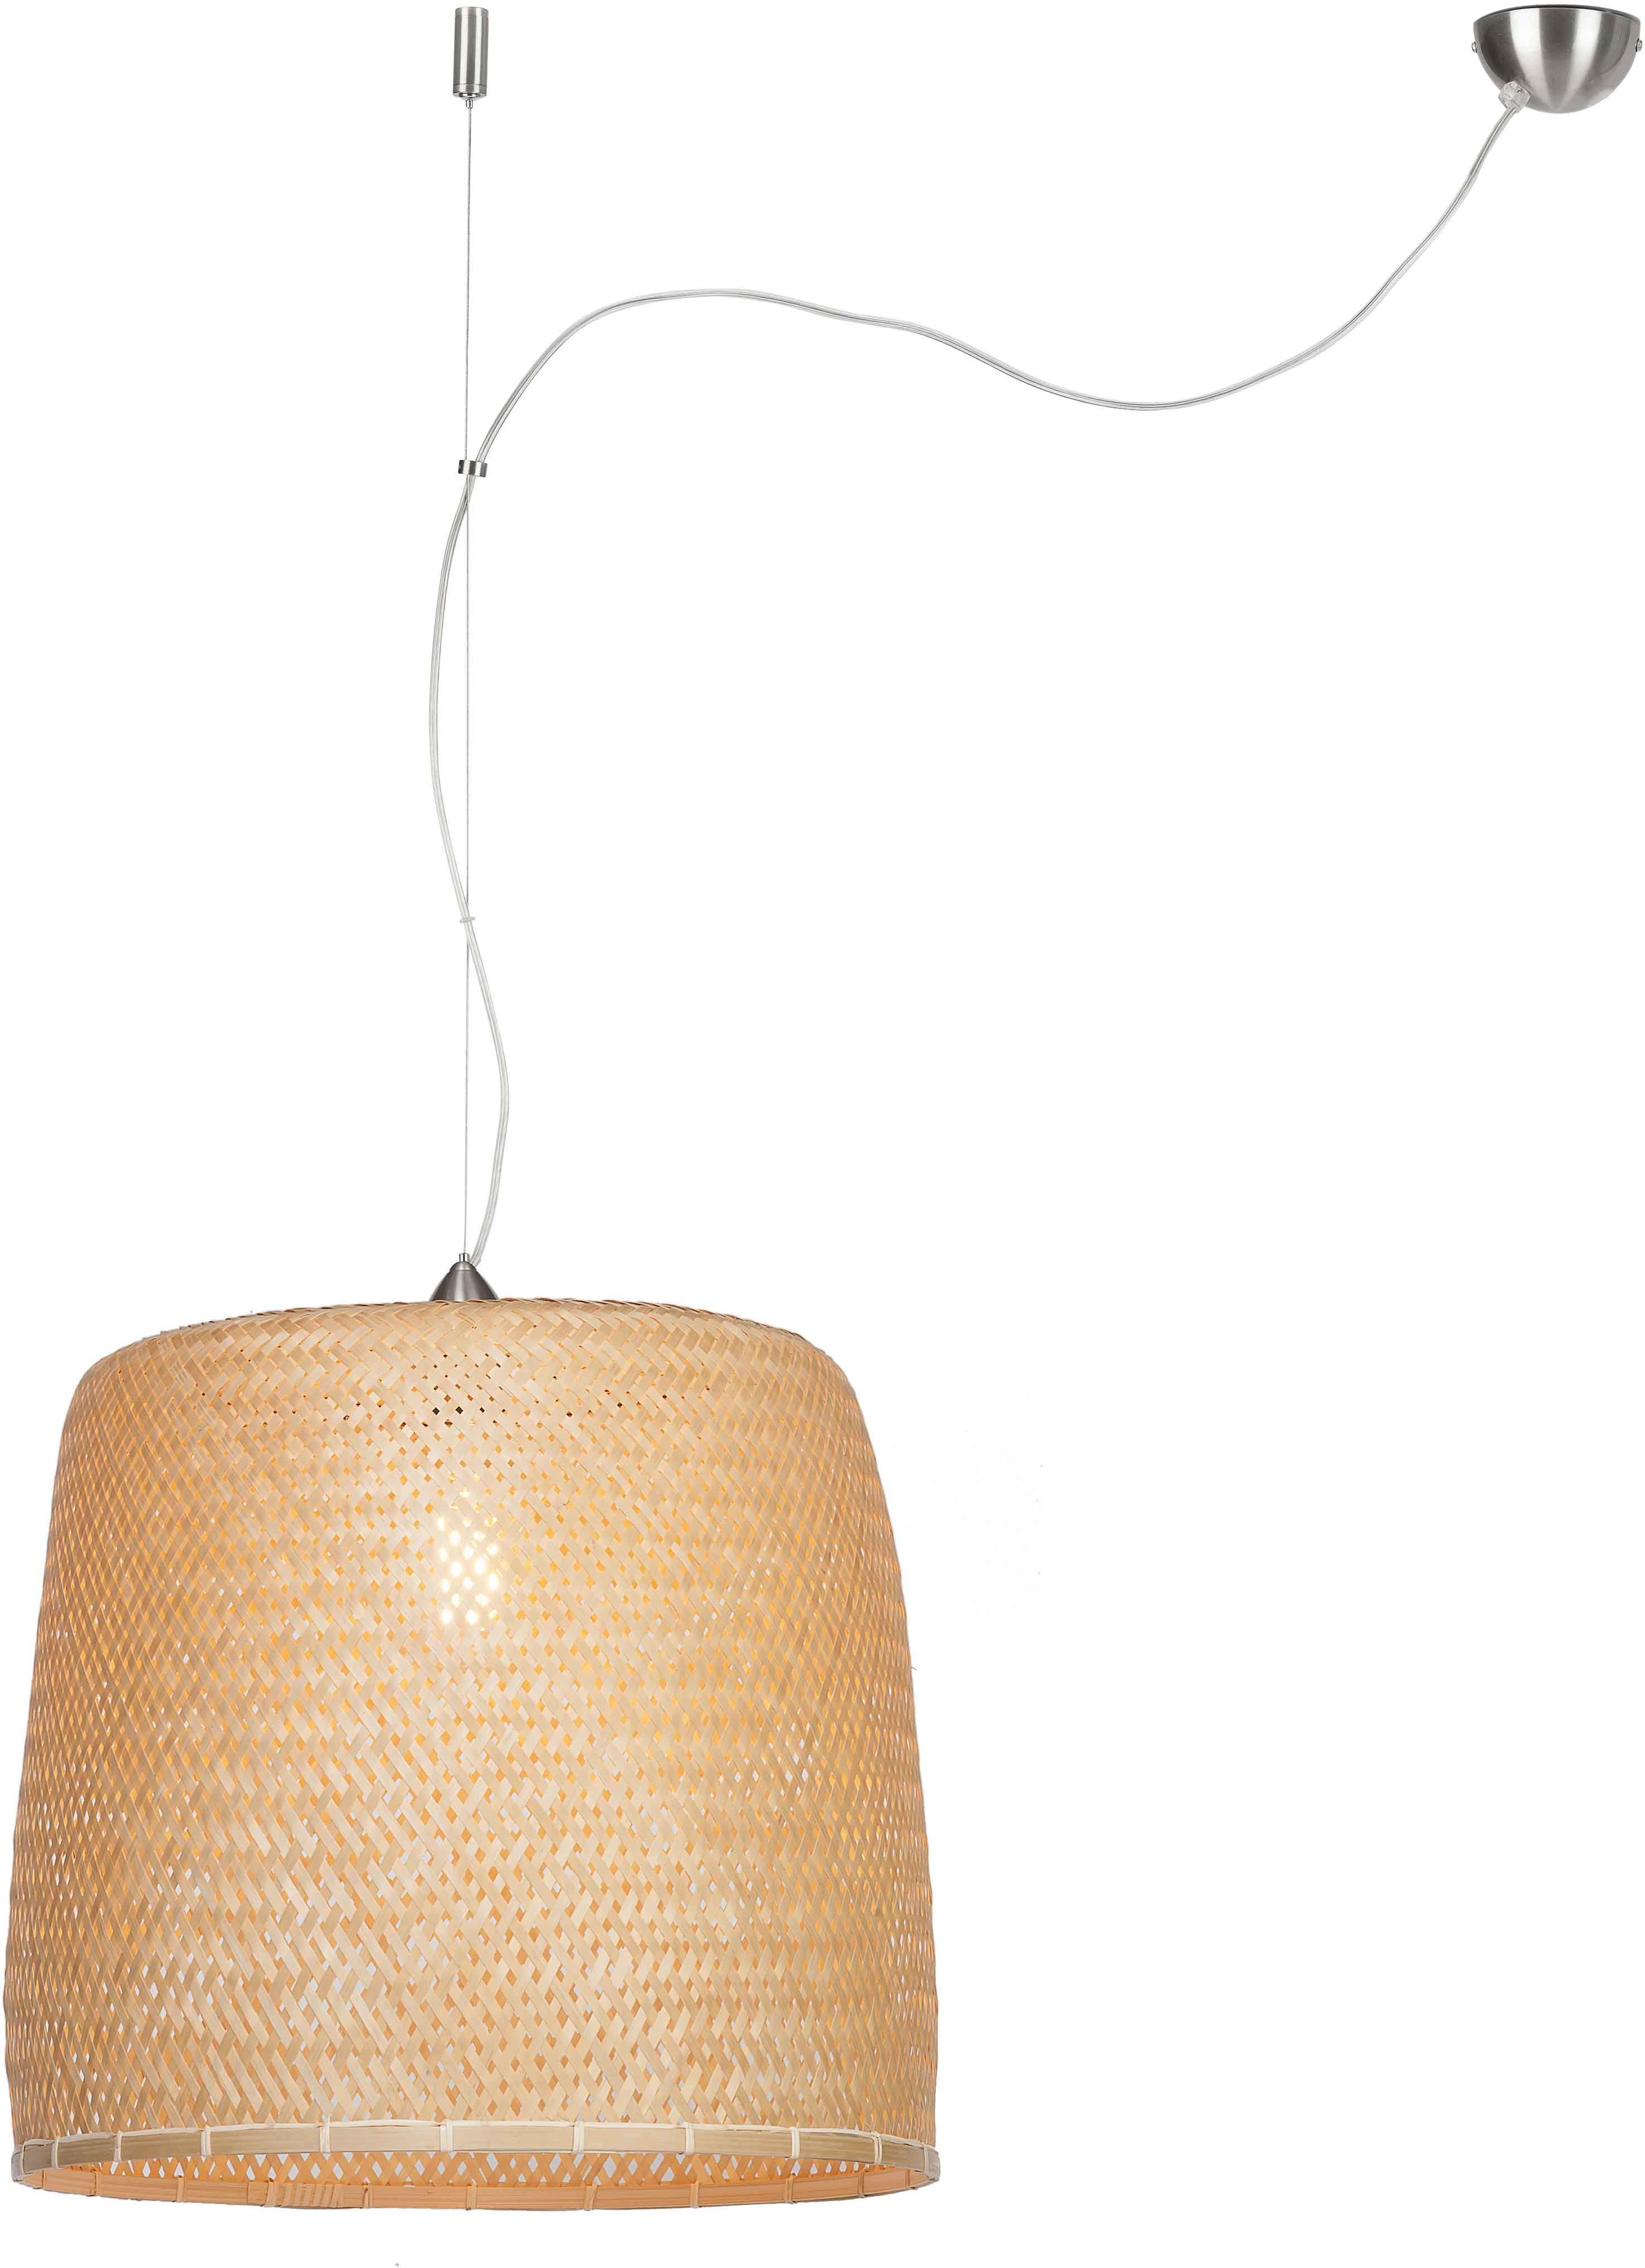 It's About RoMi It's About RoMi Lampa wisząca Serengeti bambusowa, pojedynczy abażur SERENGETI/H1/N SERENGETI/H1/N